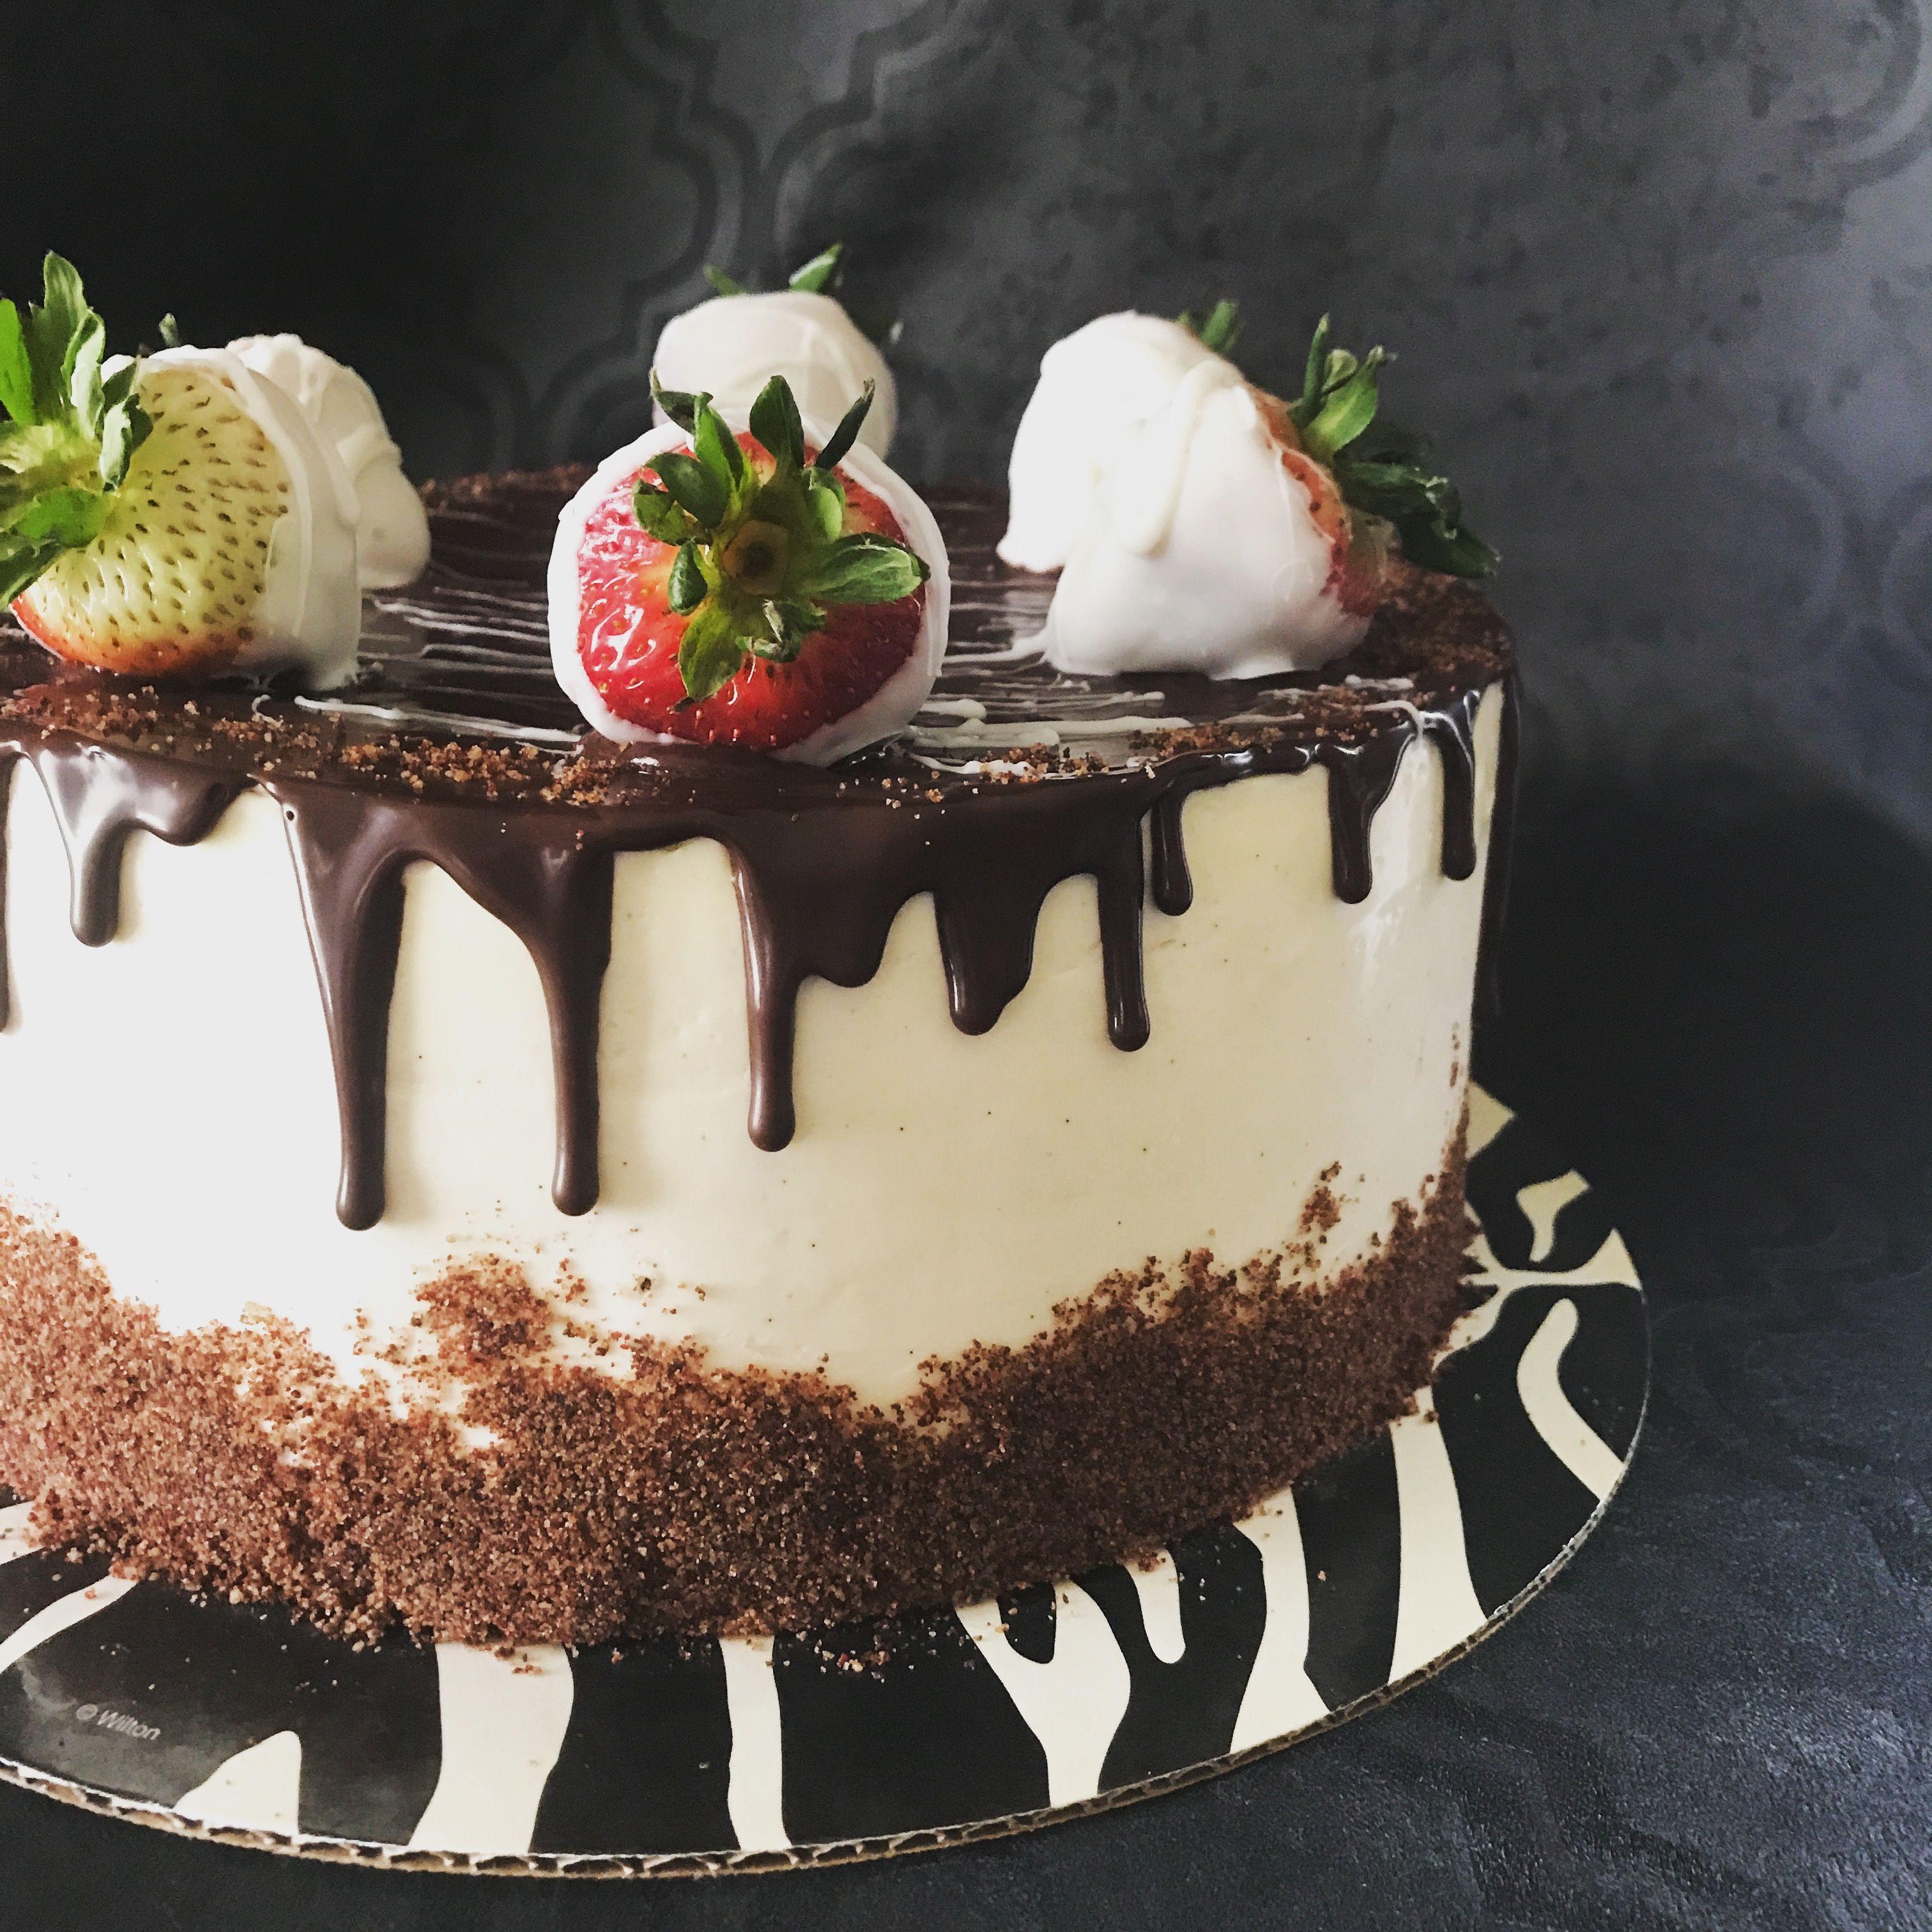 Vegan Chocolate Cake With Strawberry Filling And Vanilla Bean Vegan Buttercream Niki Diggs Cakes Ca Vegan Cake Vegan Chocolate Cake Strawberry Cake Filling